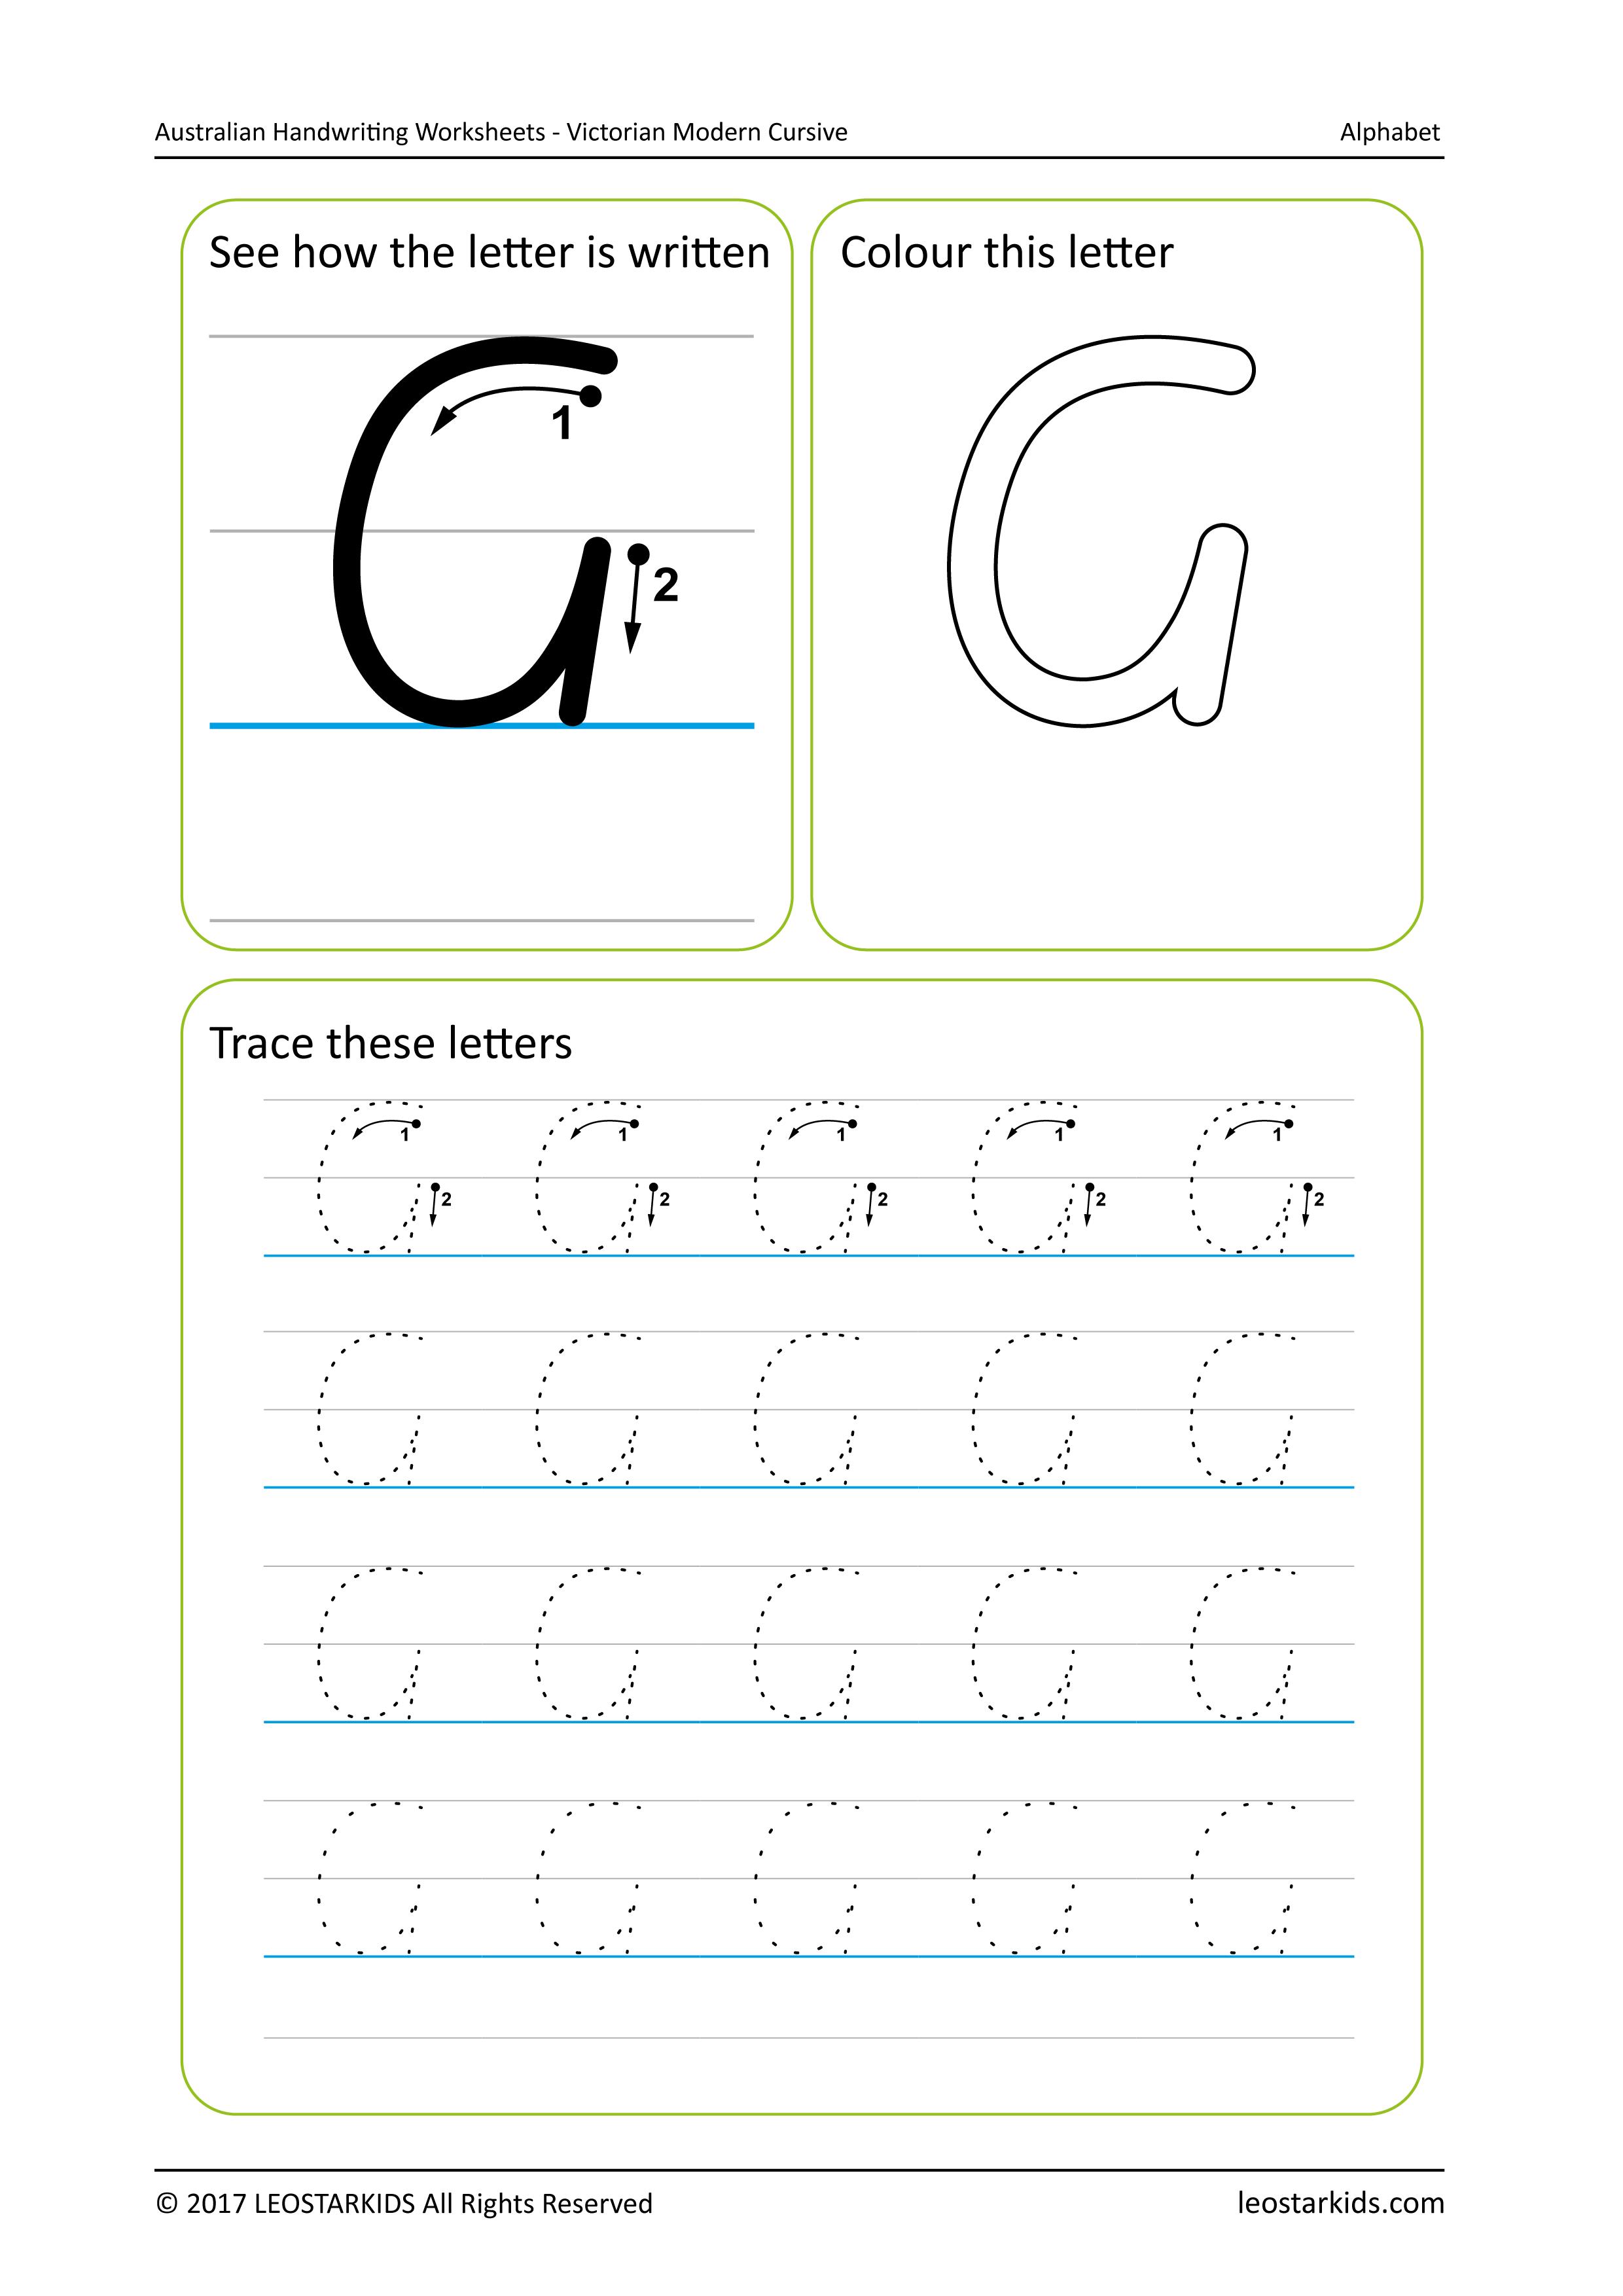 Australian Handwriting Worksheets - Victorian Modern Cursive regarding Name Tracing Template Australia